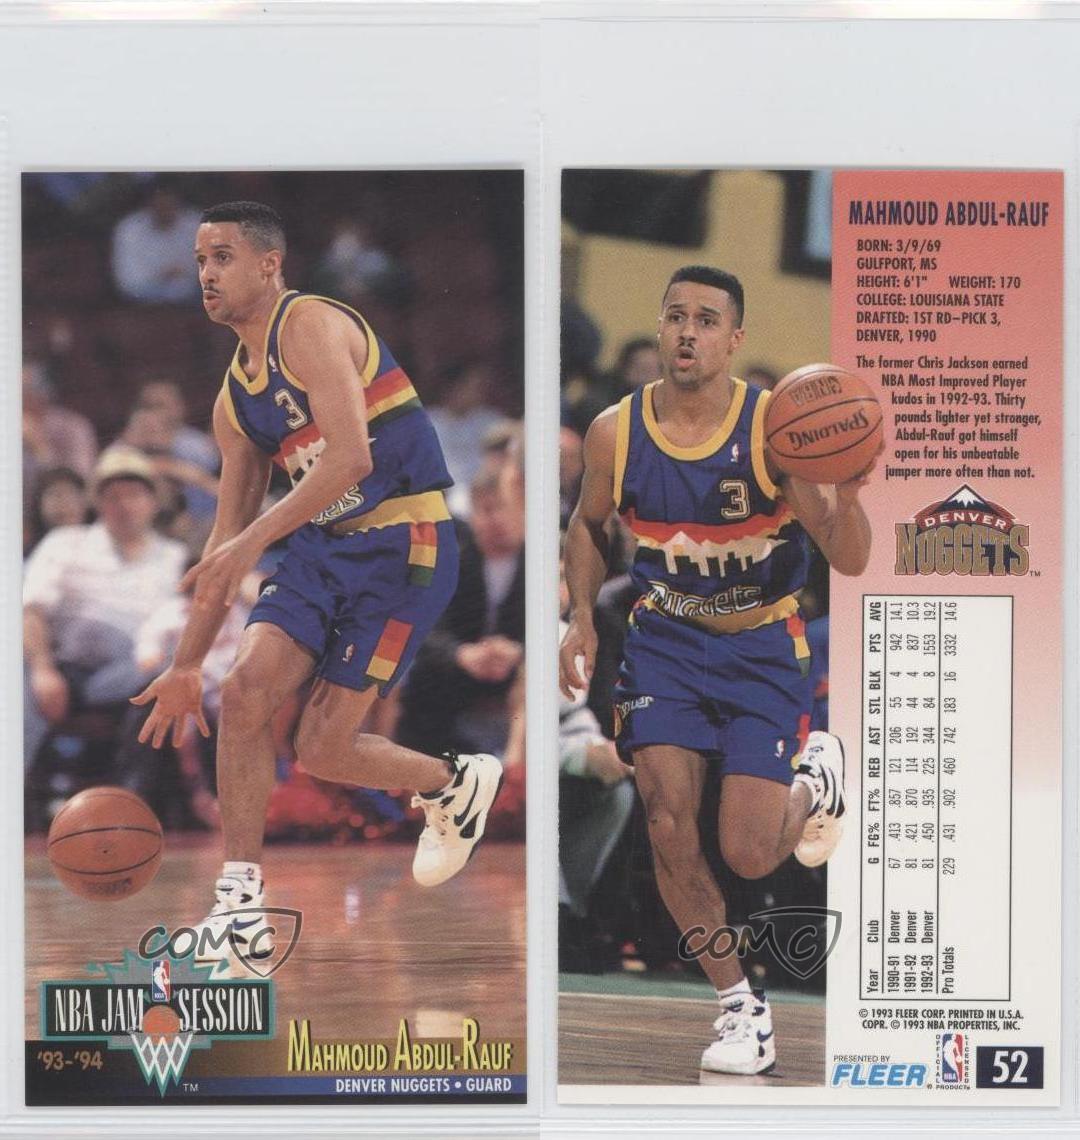 1993-94 NBA Jam Session #52 Mahmoud Abdul-Rauf Denver